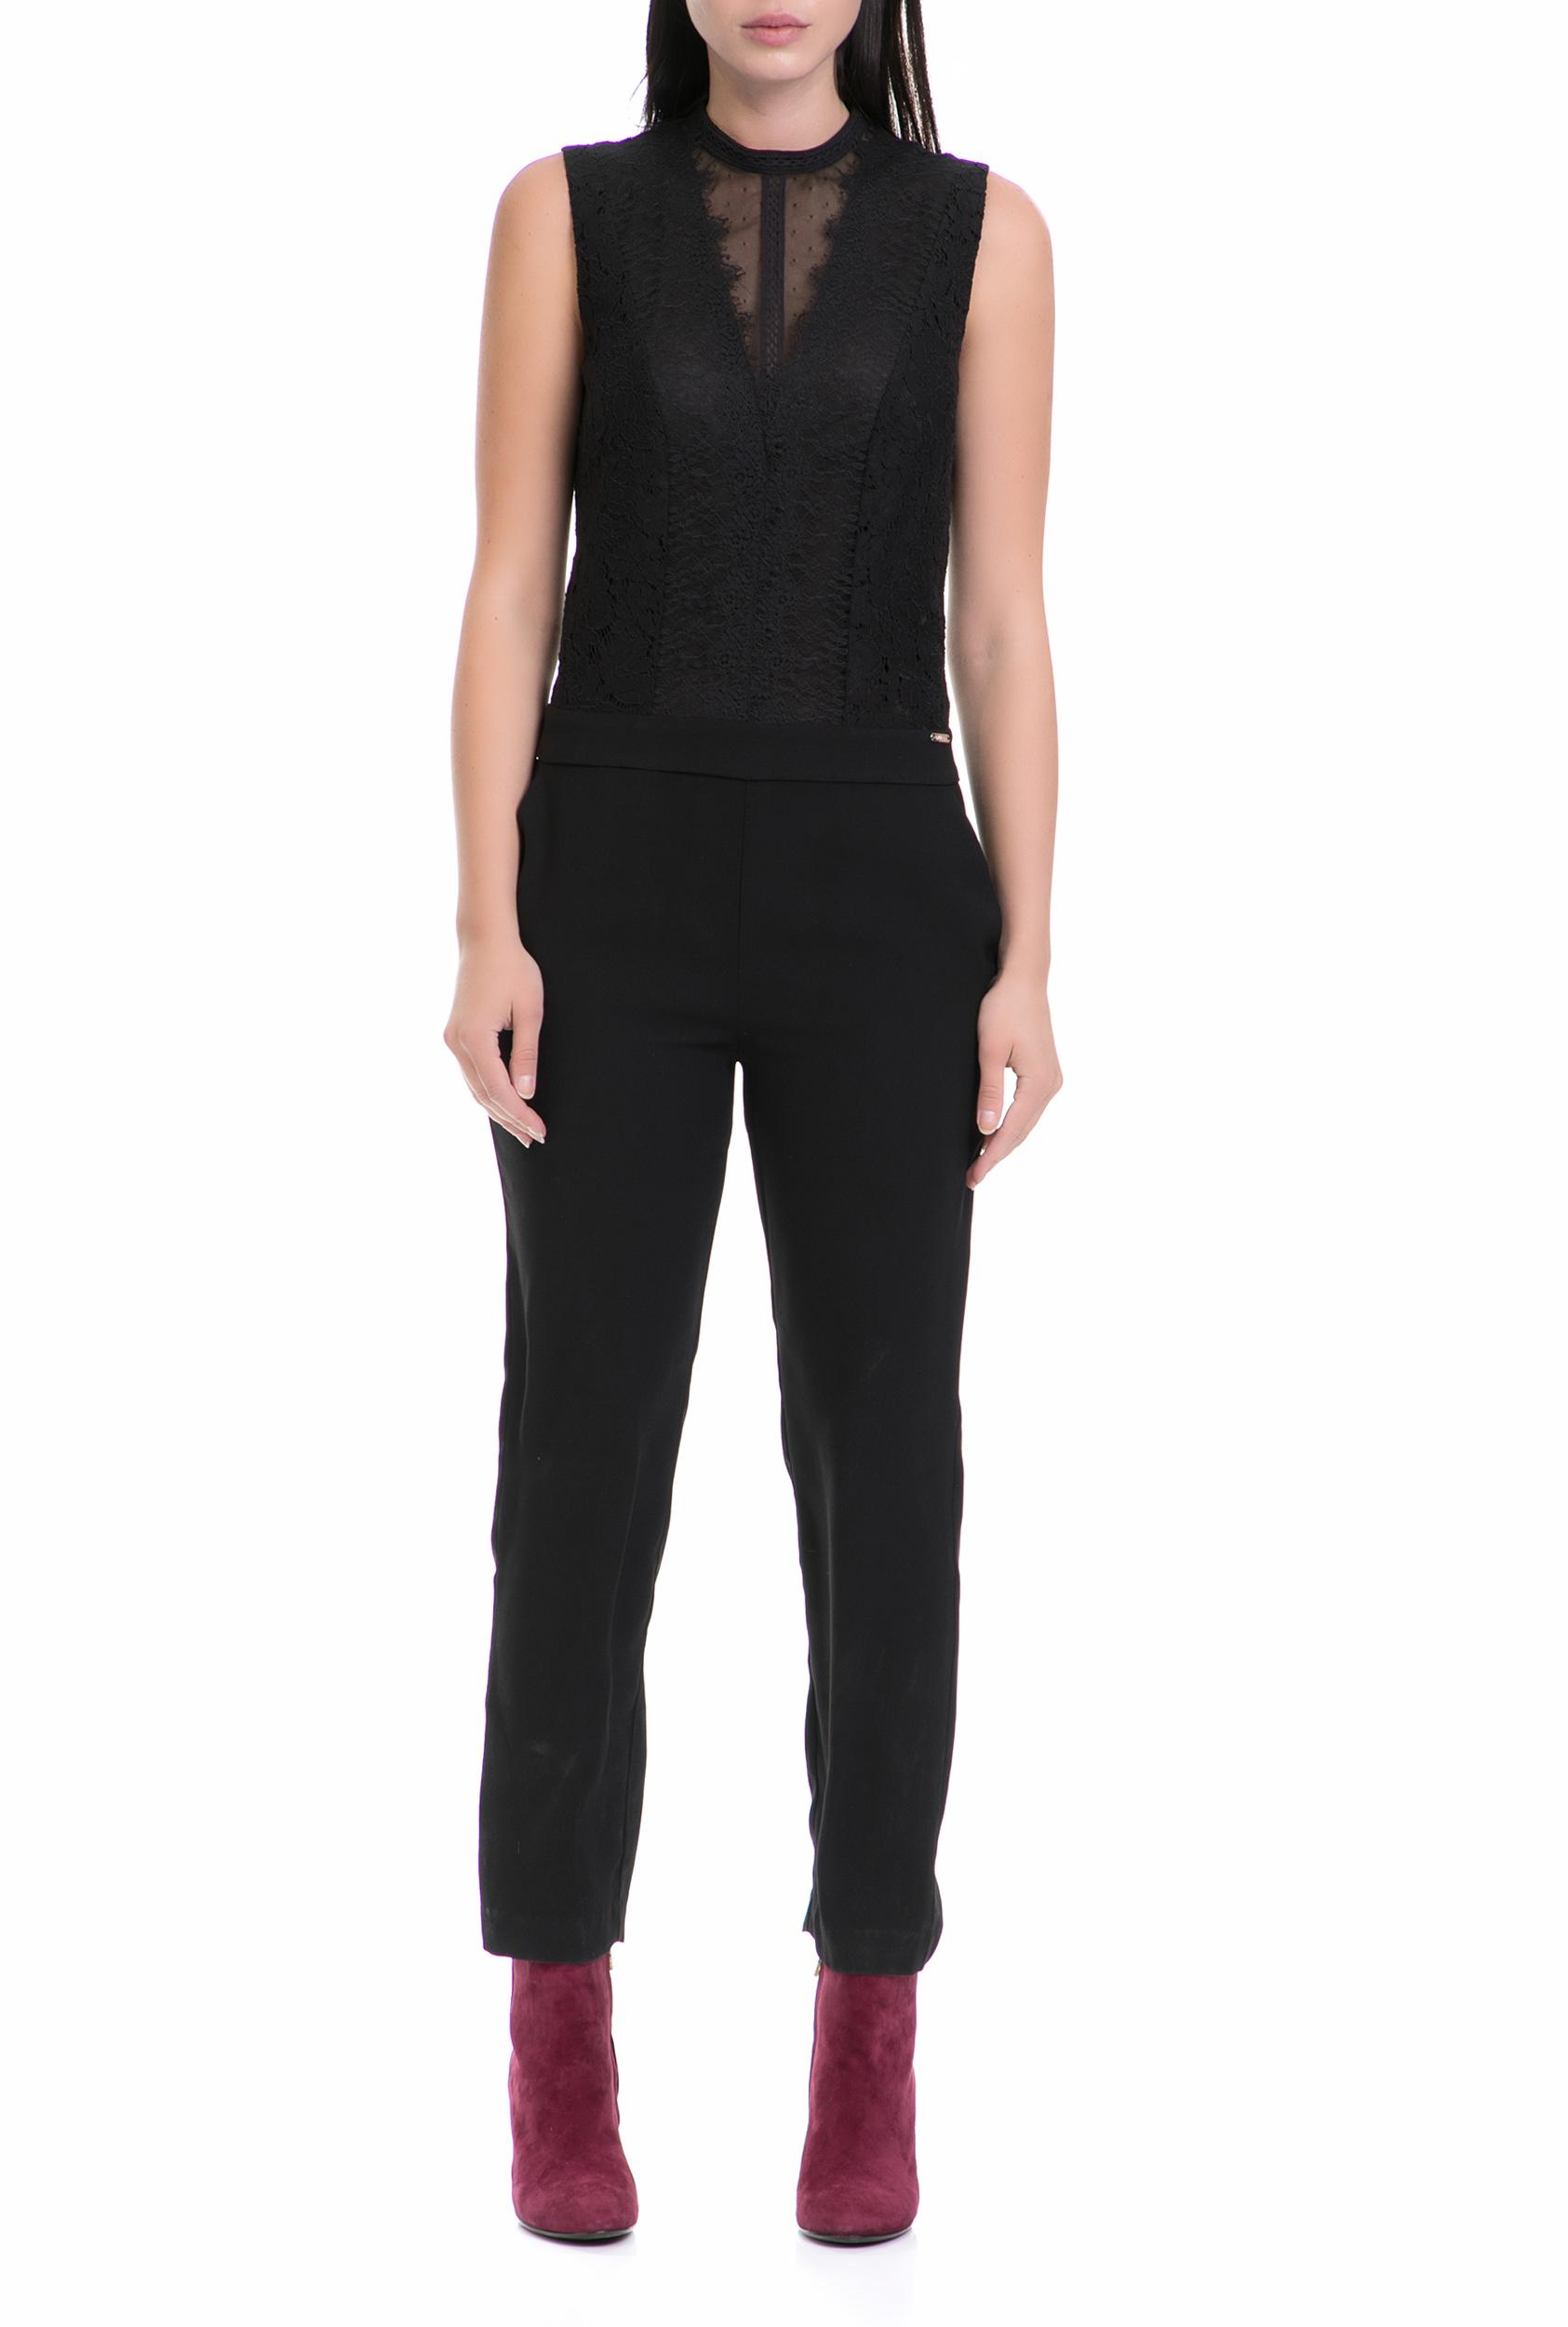 GUESS – Γυναικεία ολόσωμη φόρμα ELDA GUESS μαύρη 66f1b606d5b